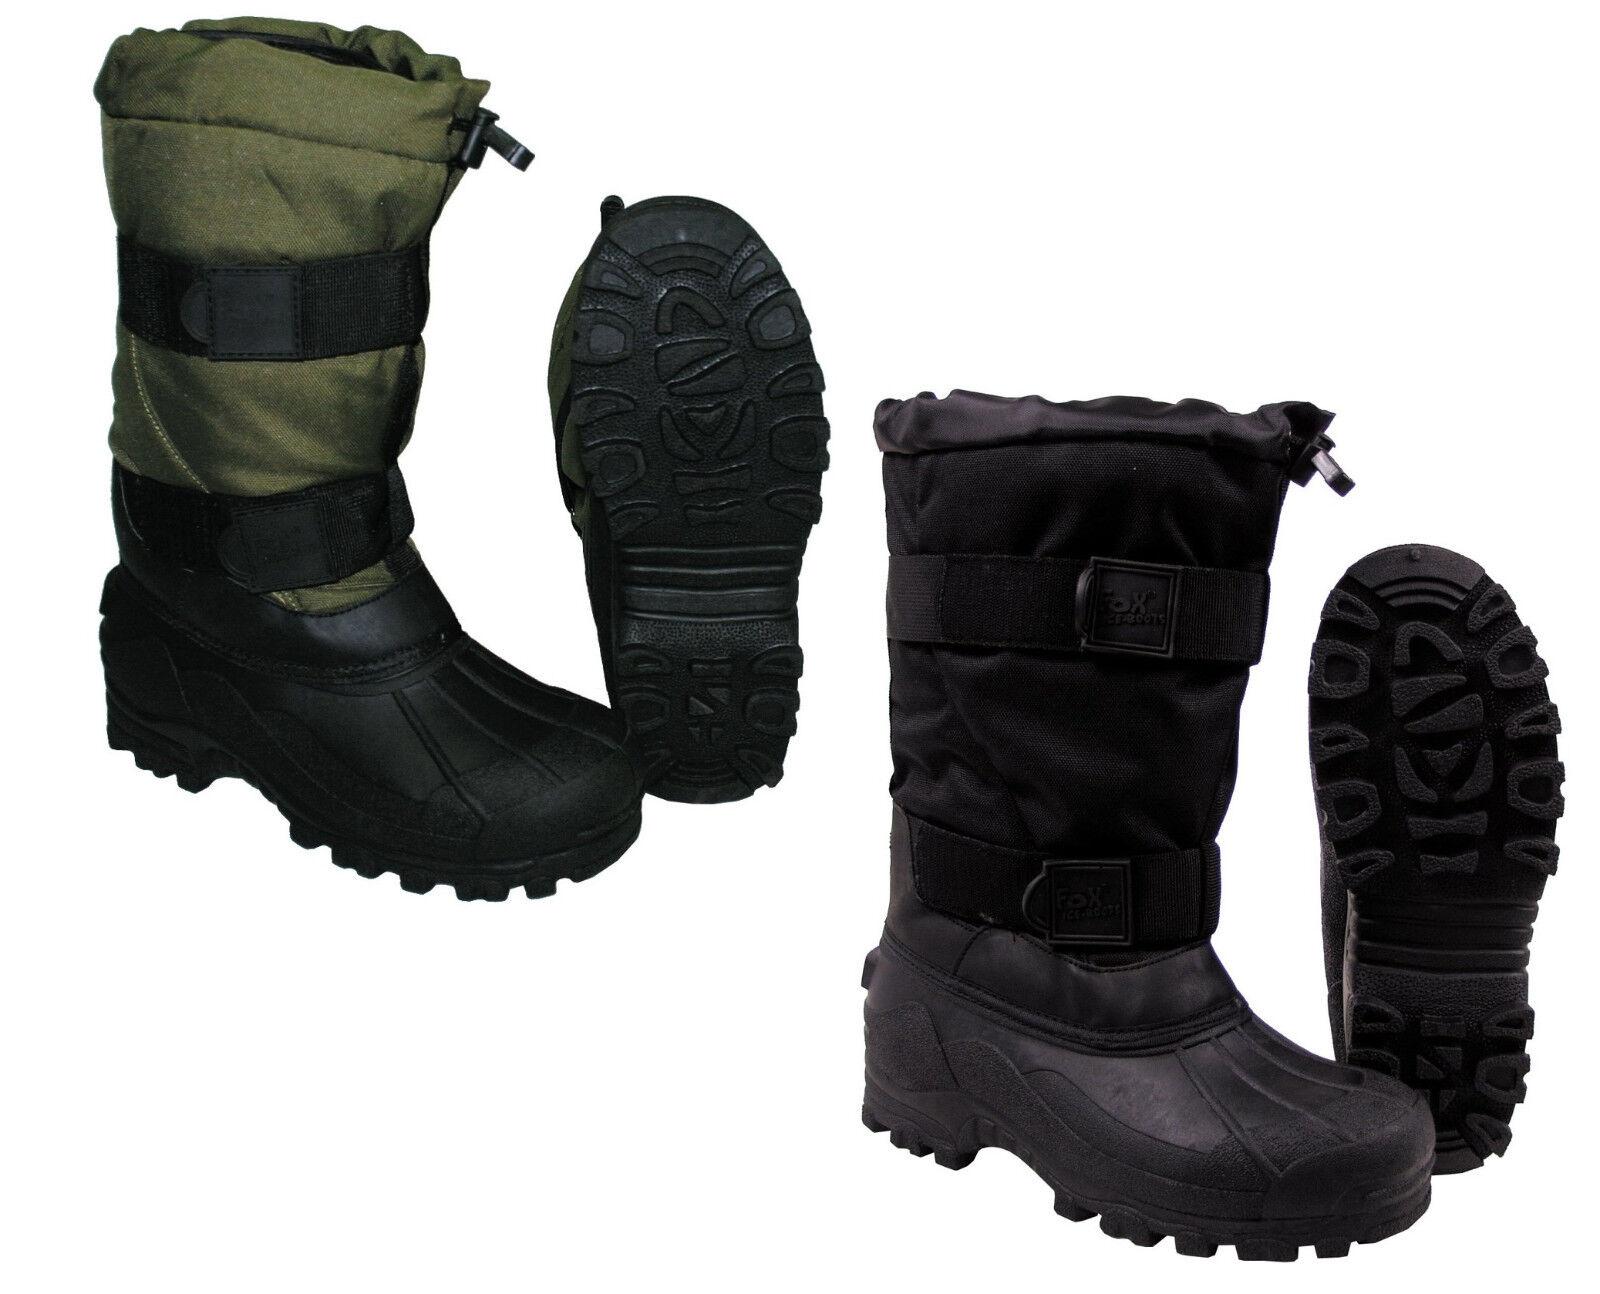 Kälteschutzstiefel Thermostiefel FOX ICE Stiefel Thermostiefel Kälteschutzstiefel bis -40°C, Winterstiefel Grün 7b2b2e